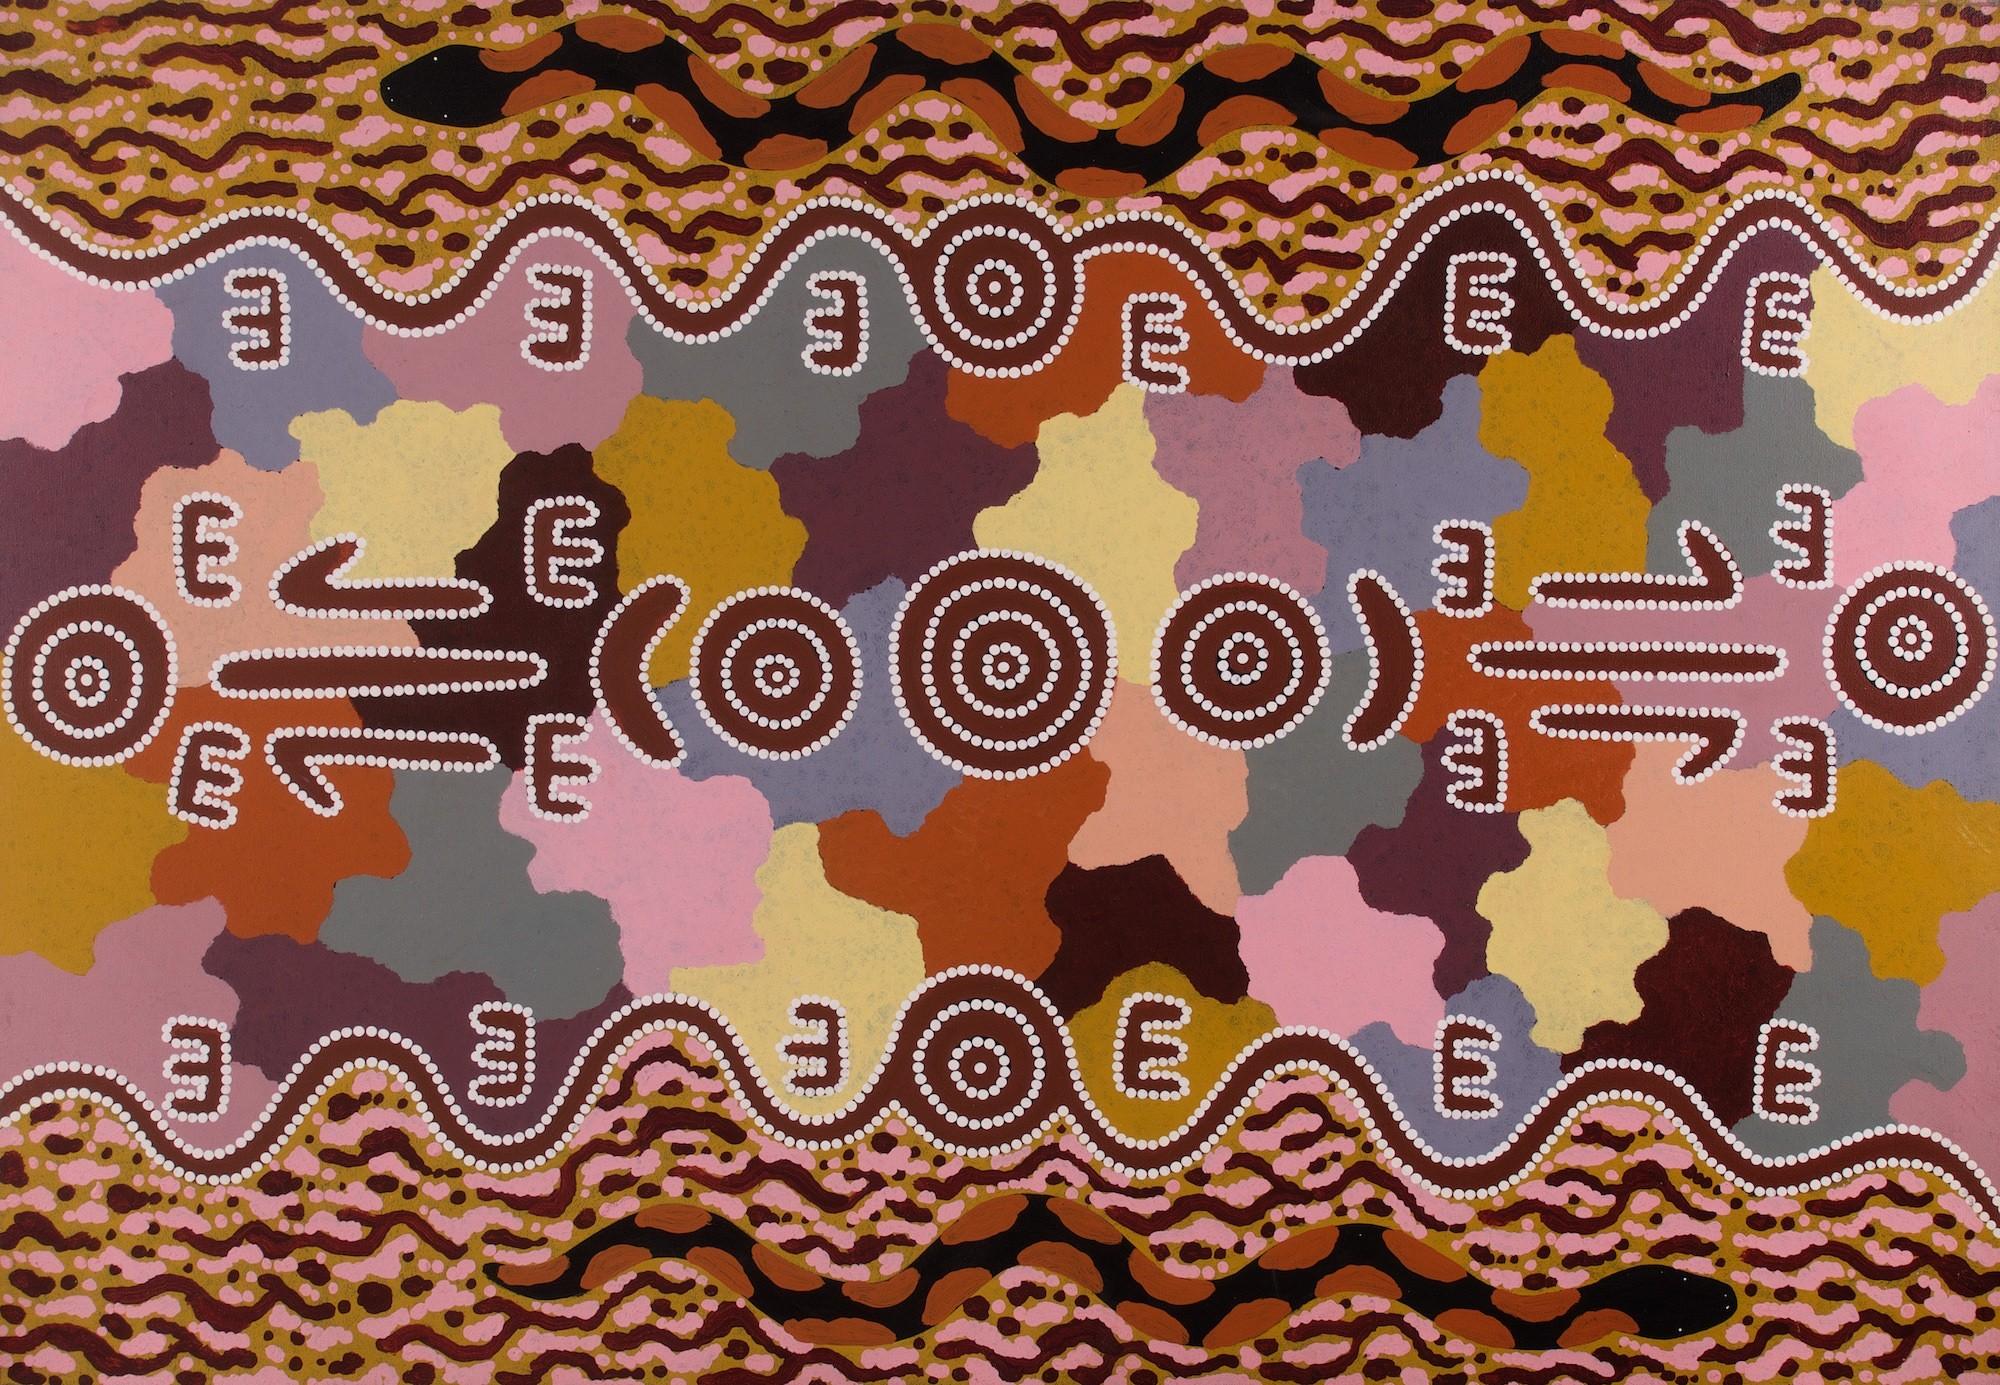 Michael Nelson Jagammara ' Four Dreaming' (1996) 148x105